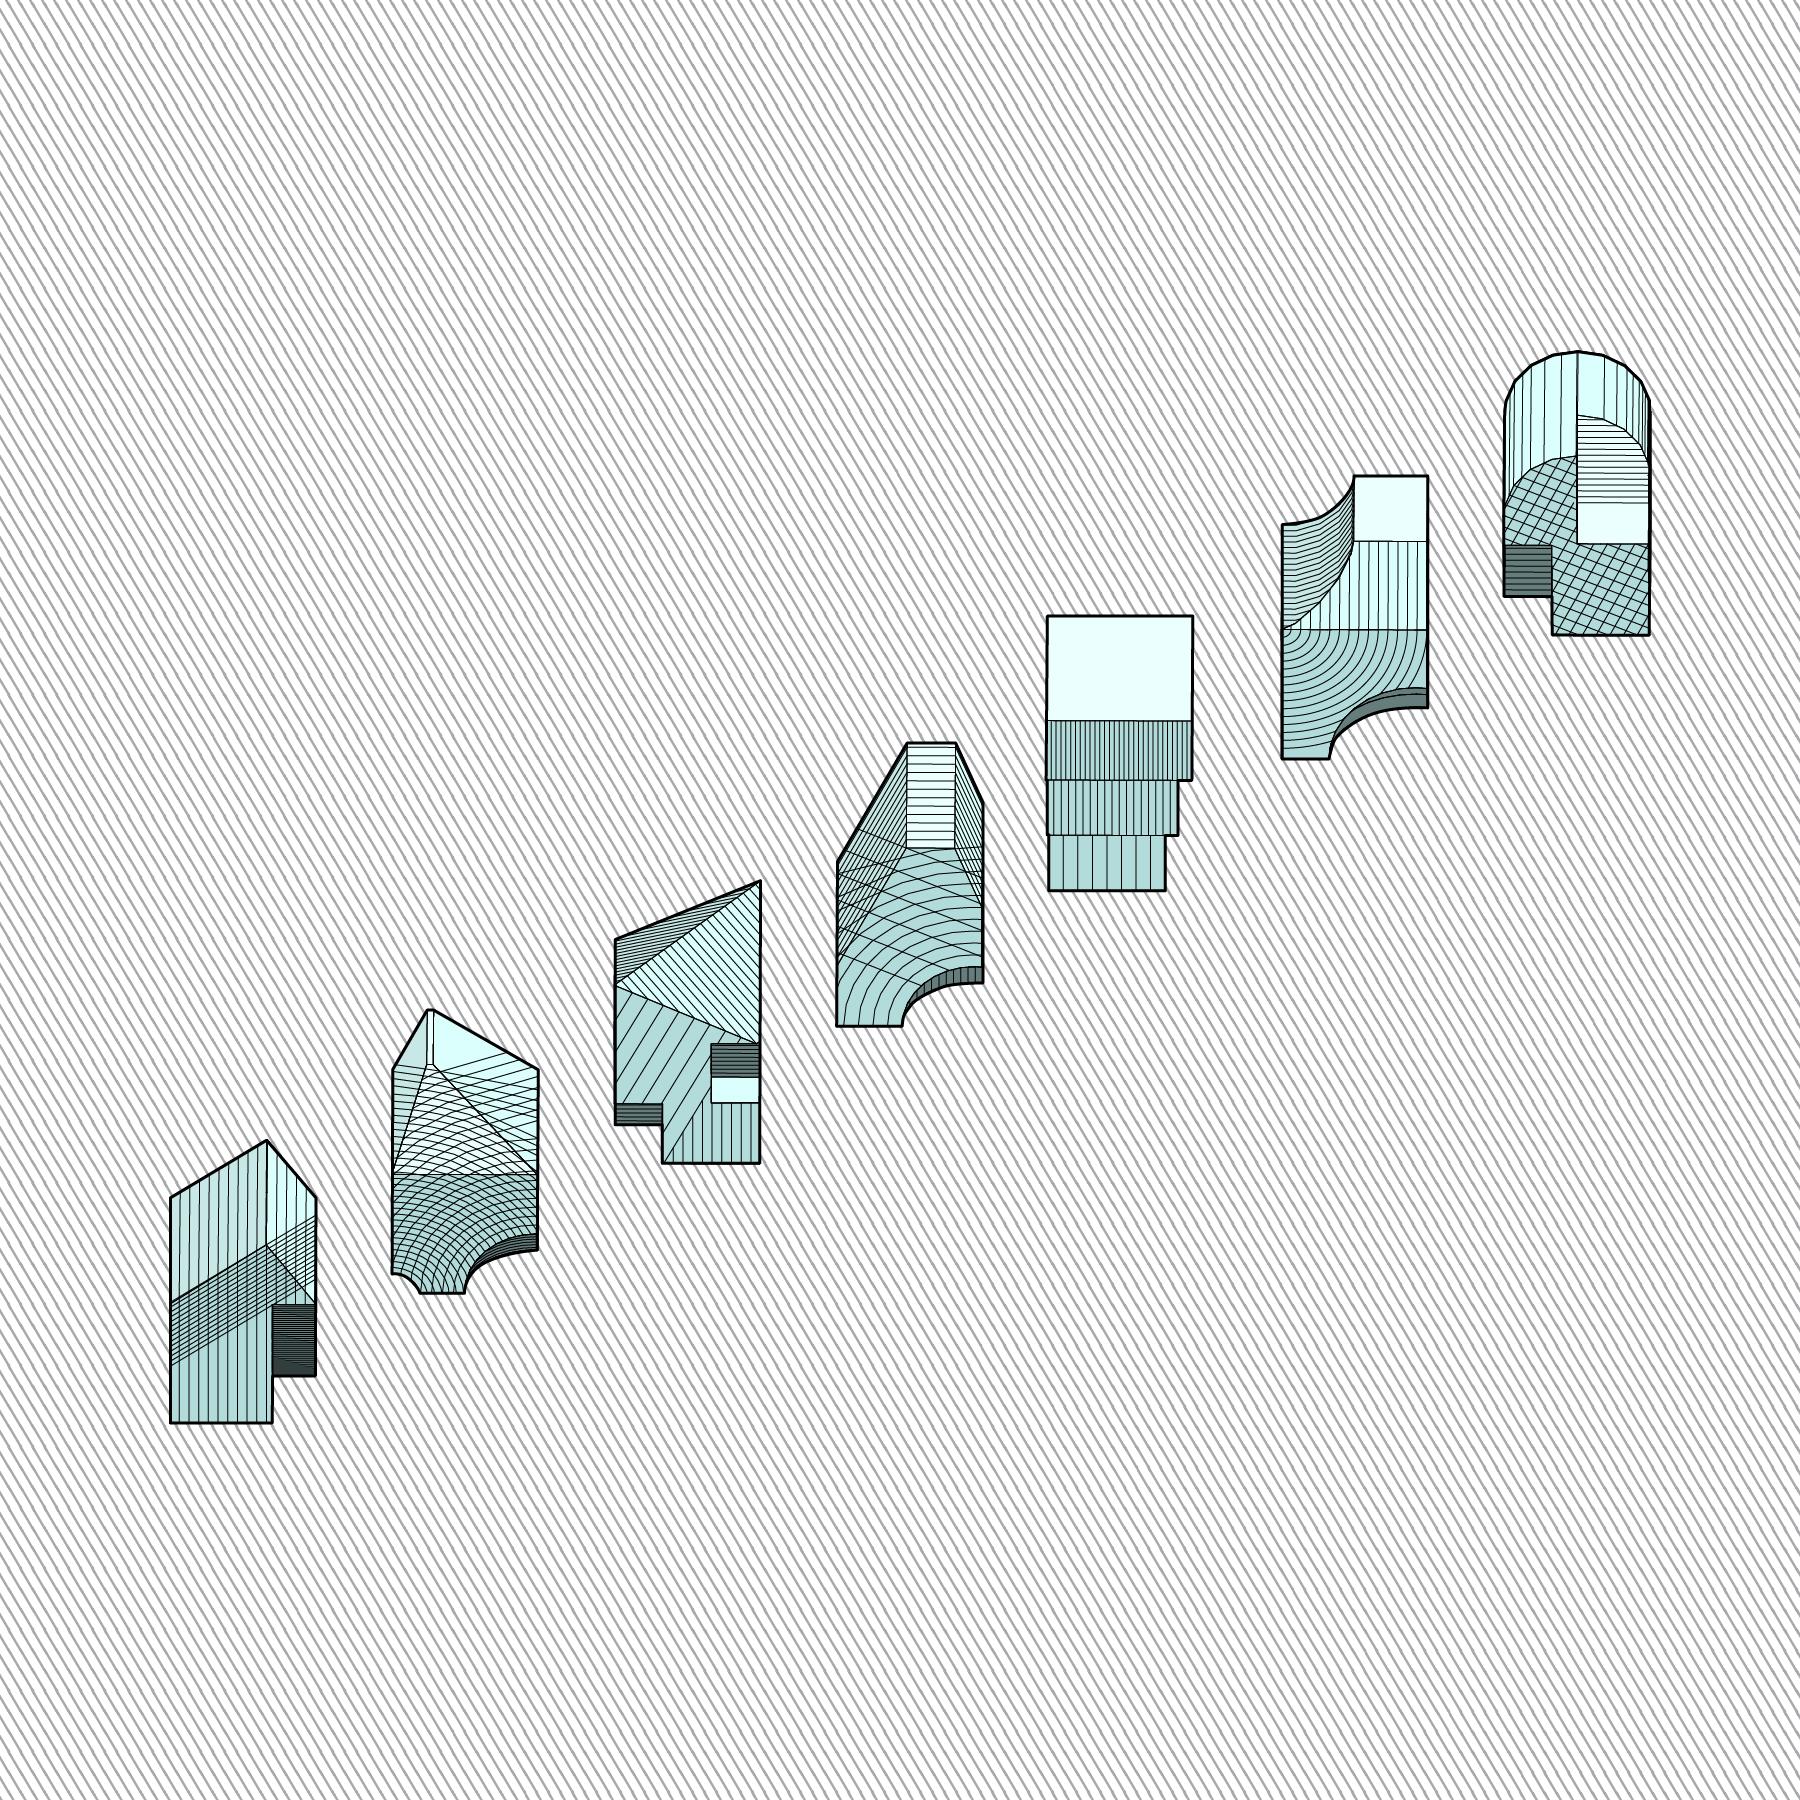 Uniqueness, Discrete, Projection, Pattern